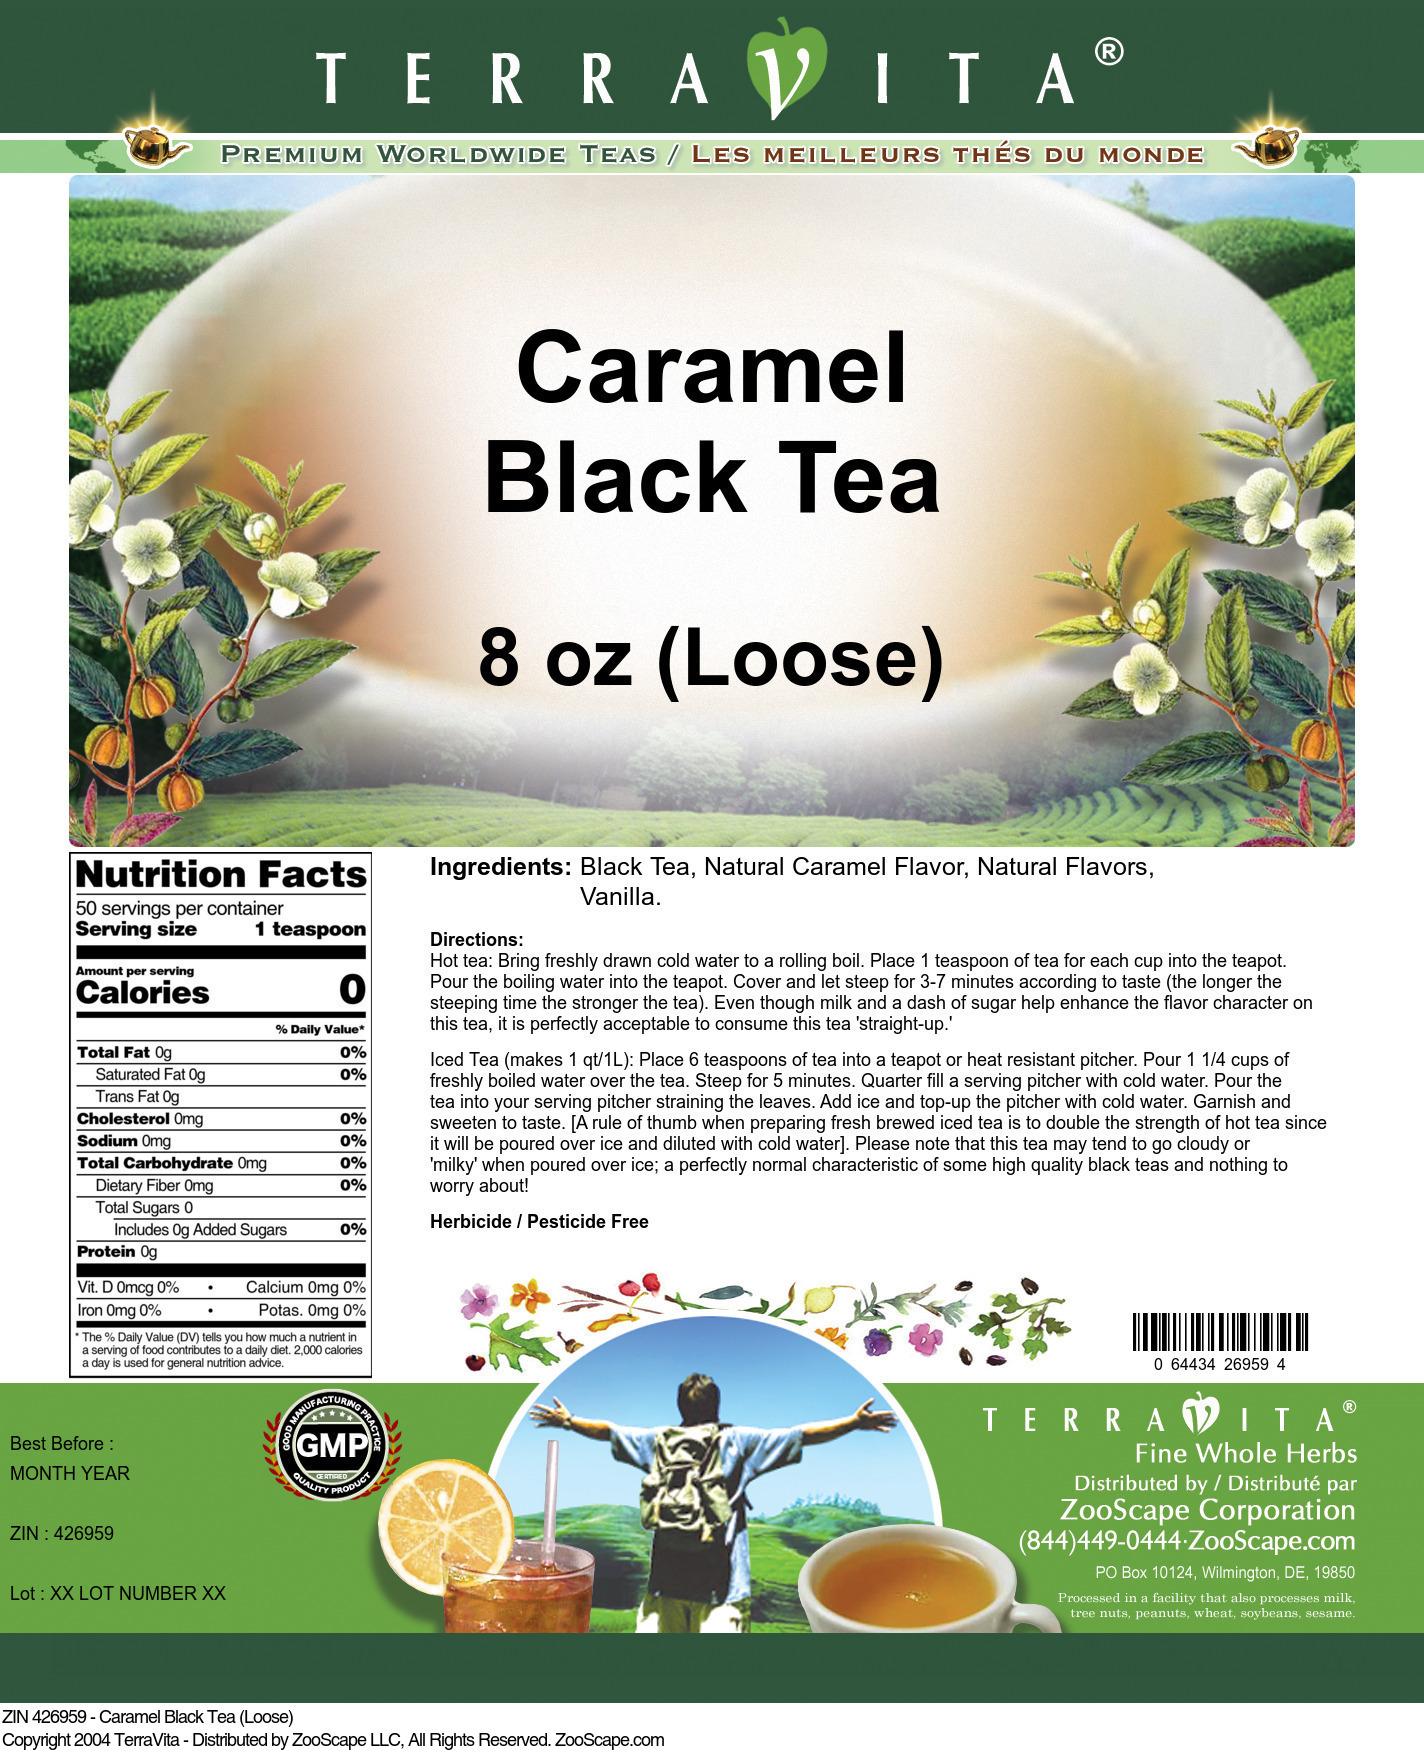 Caramel Black Tea (Loose)